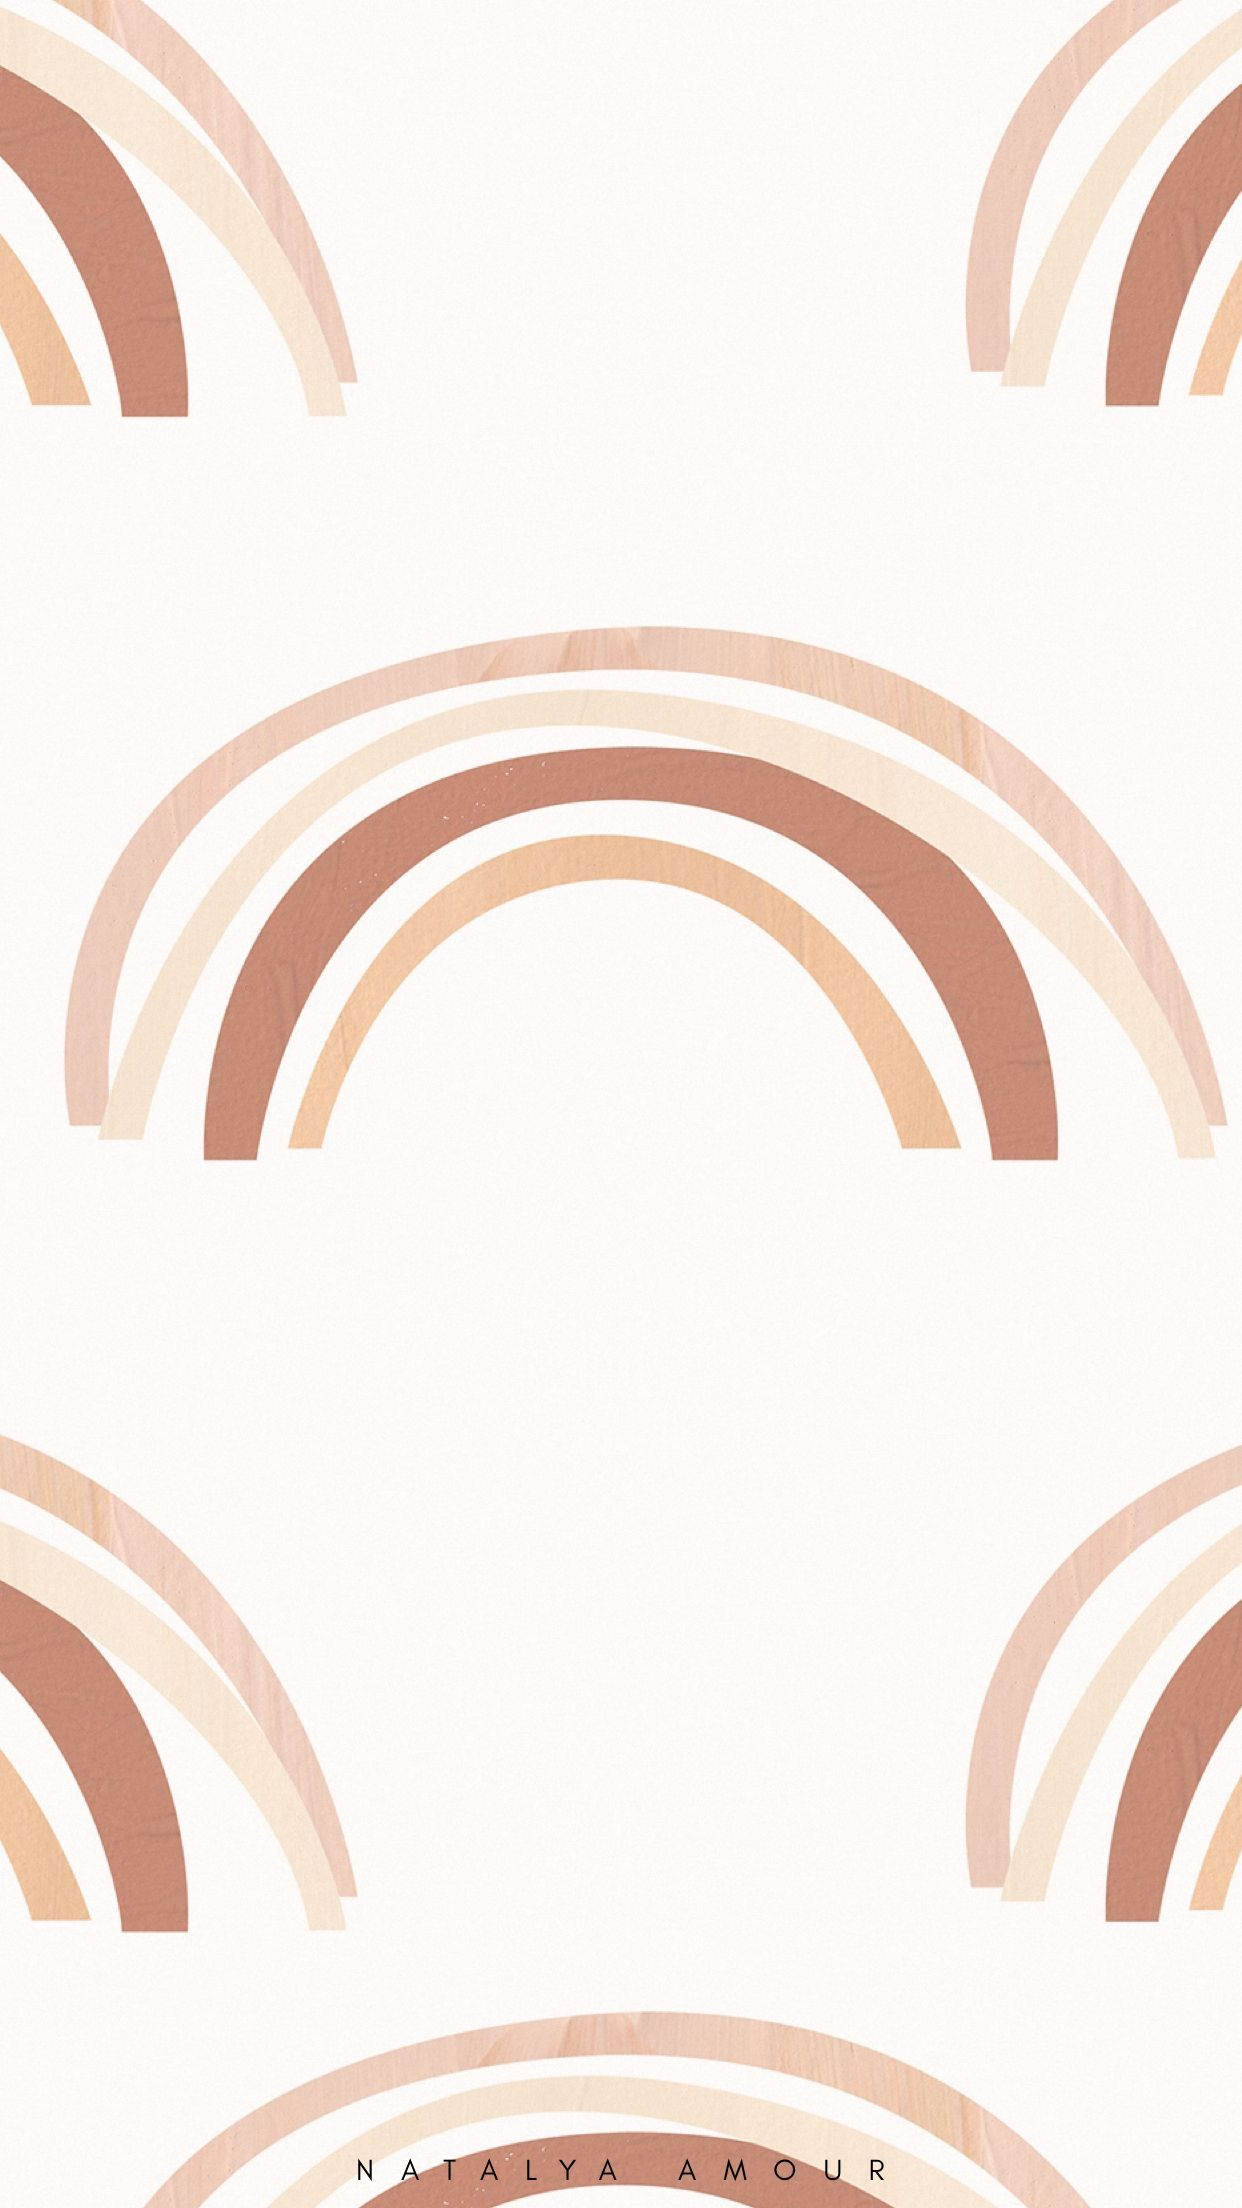 Boho Pastel Wallpapers   Top Boho Pastel Backgrounds 1242x2208